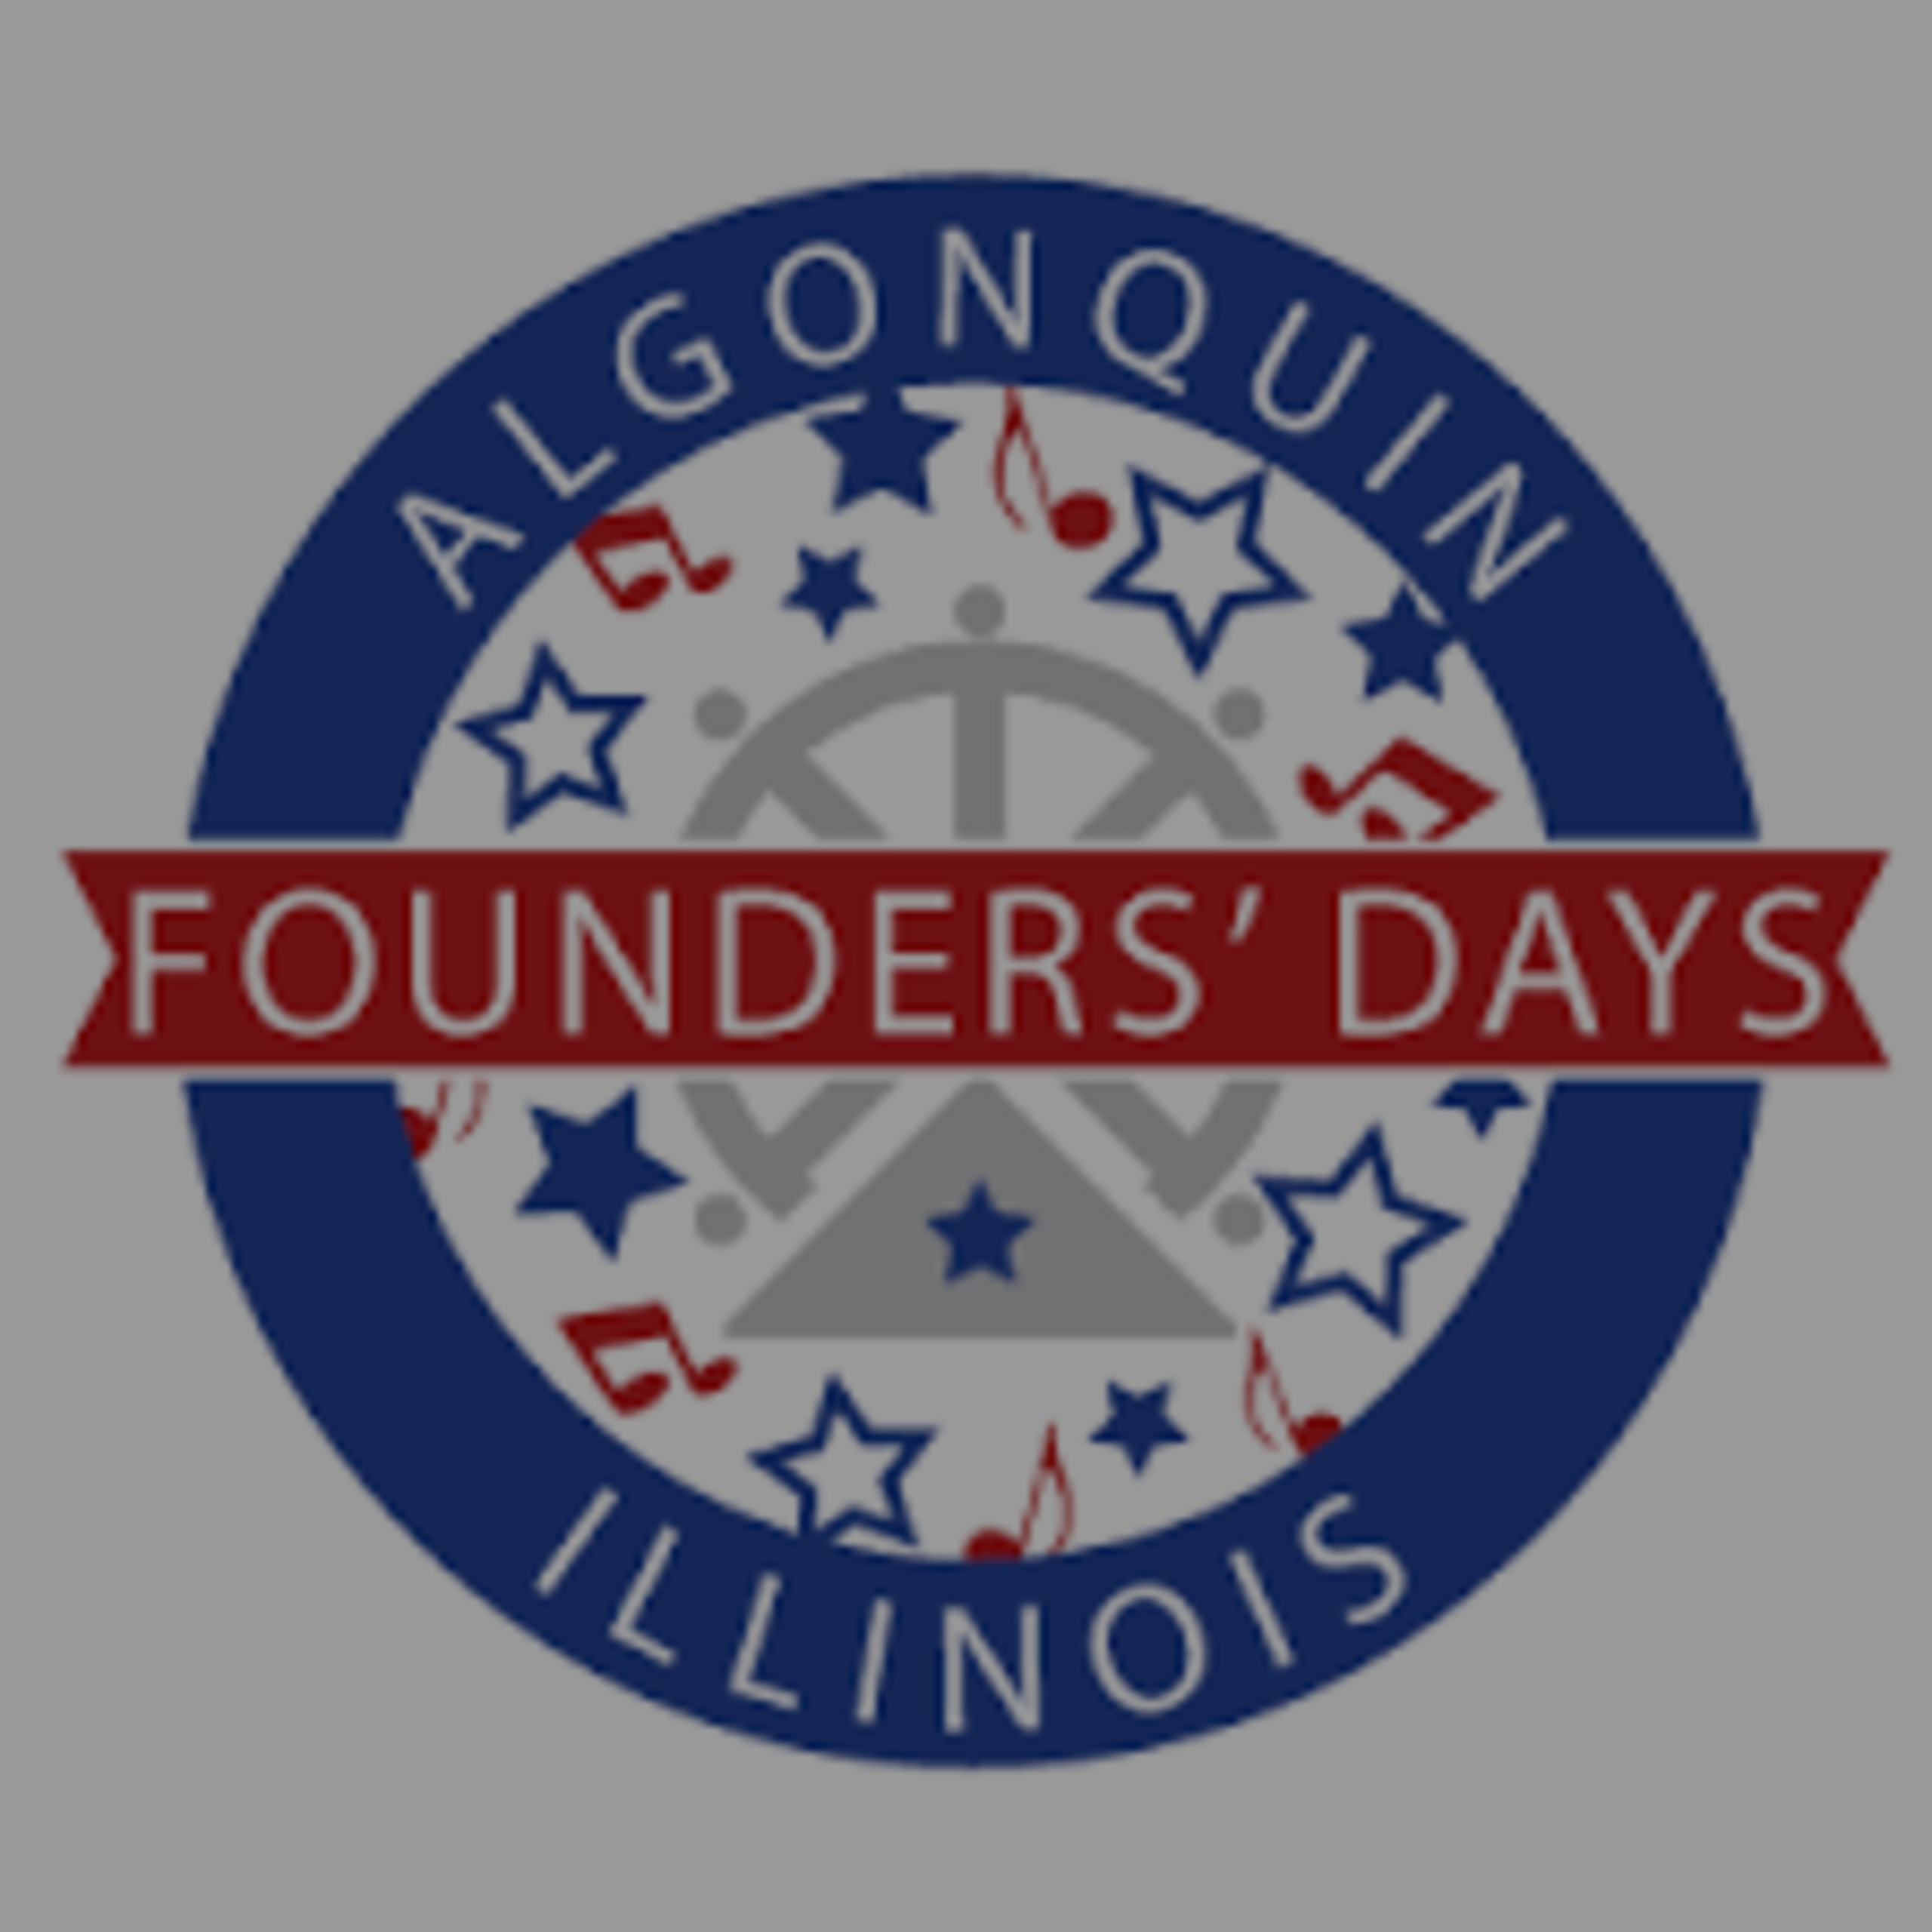 Algonquin Founder's Days Festival July 25-28, 2019